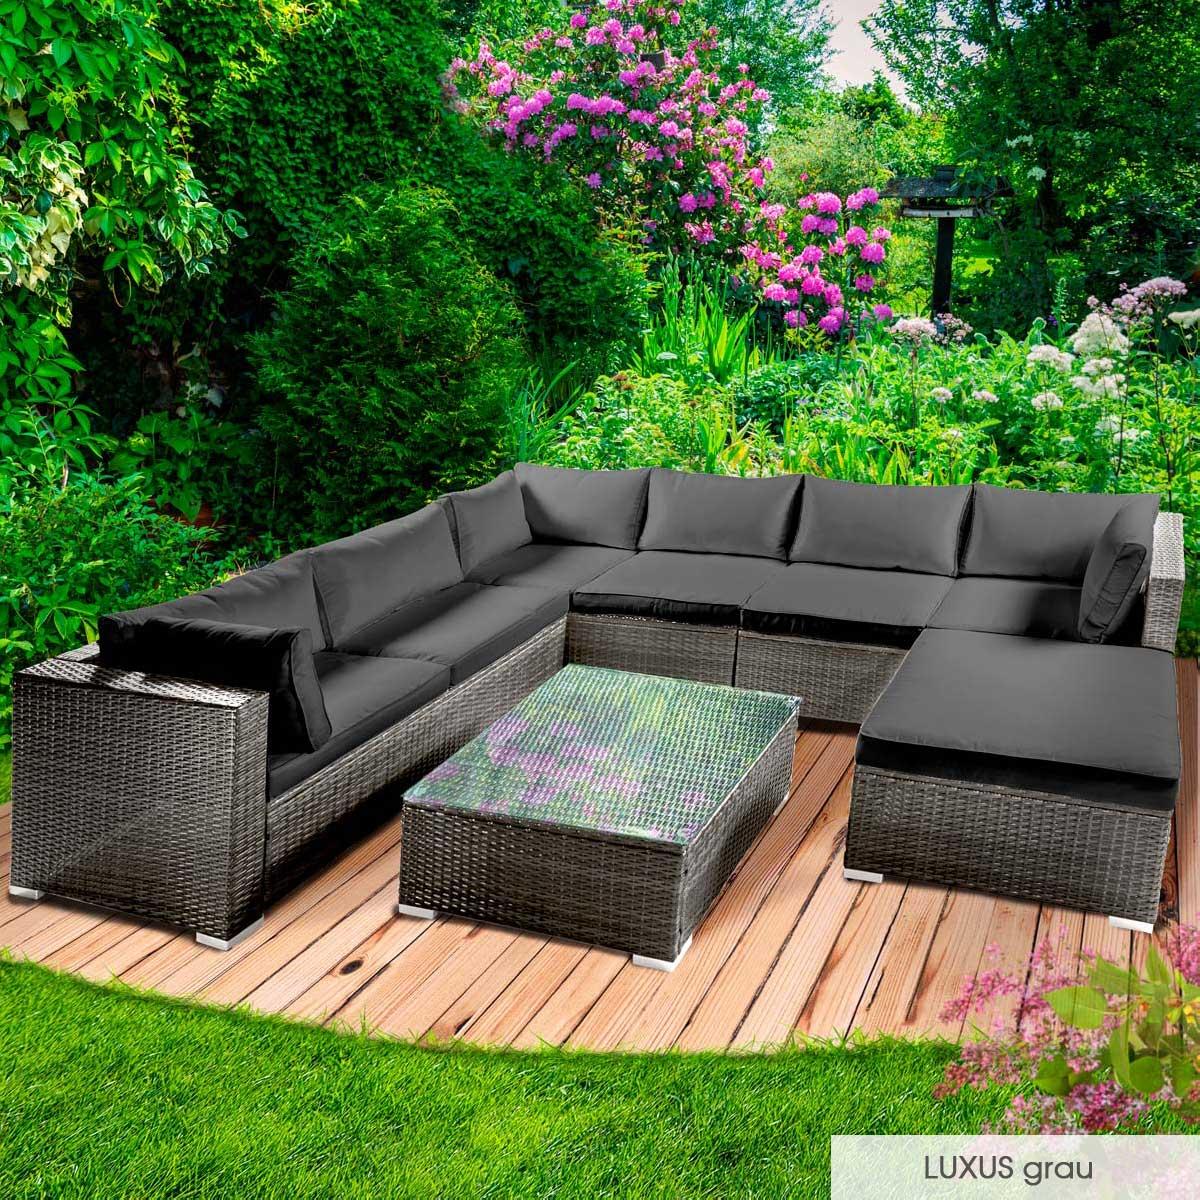 Gartenmoebel-Poly-Rattan-Lounge-Moebel-Sitzgarnitur-Gartengarnitur-Sitzgruppe-Sofa Indexbild 36